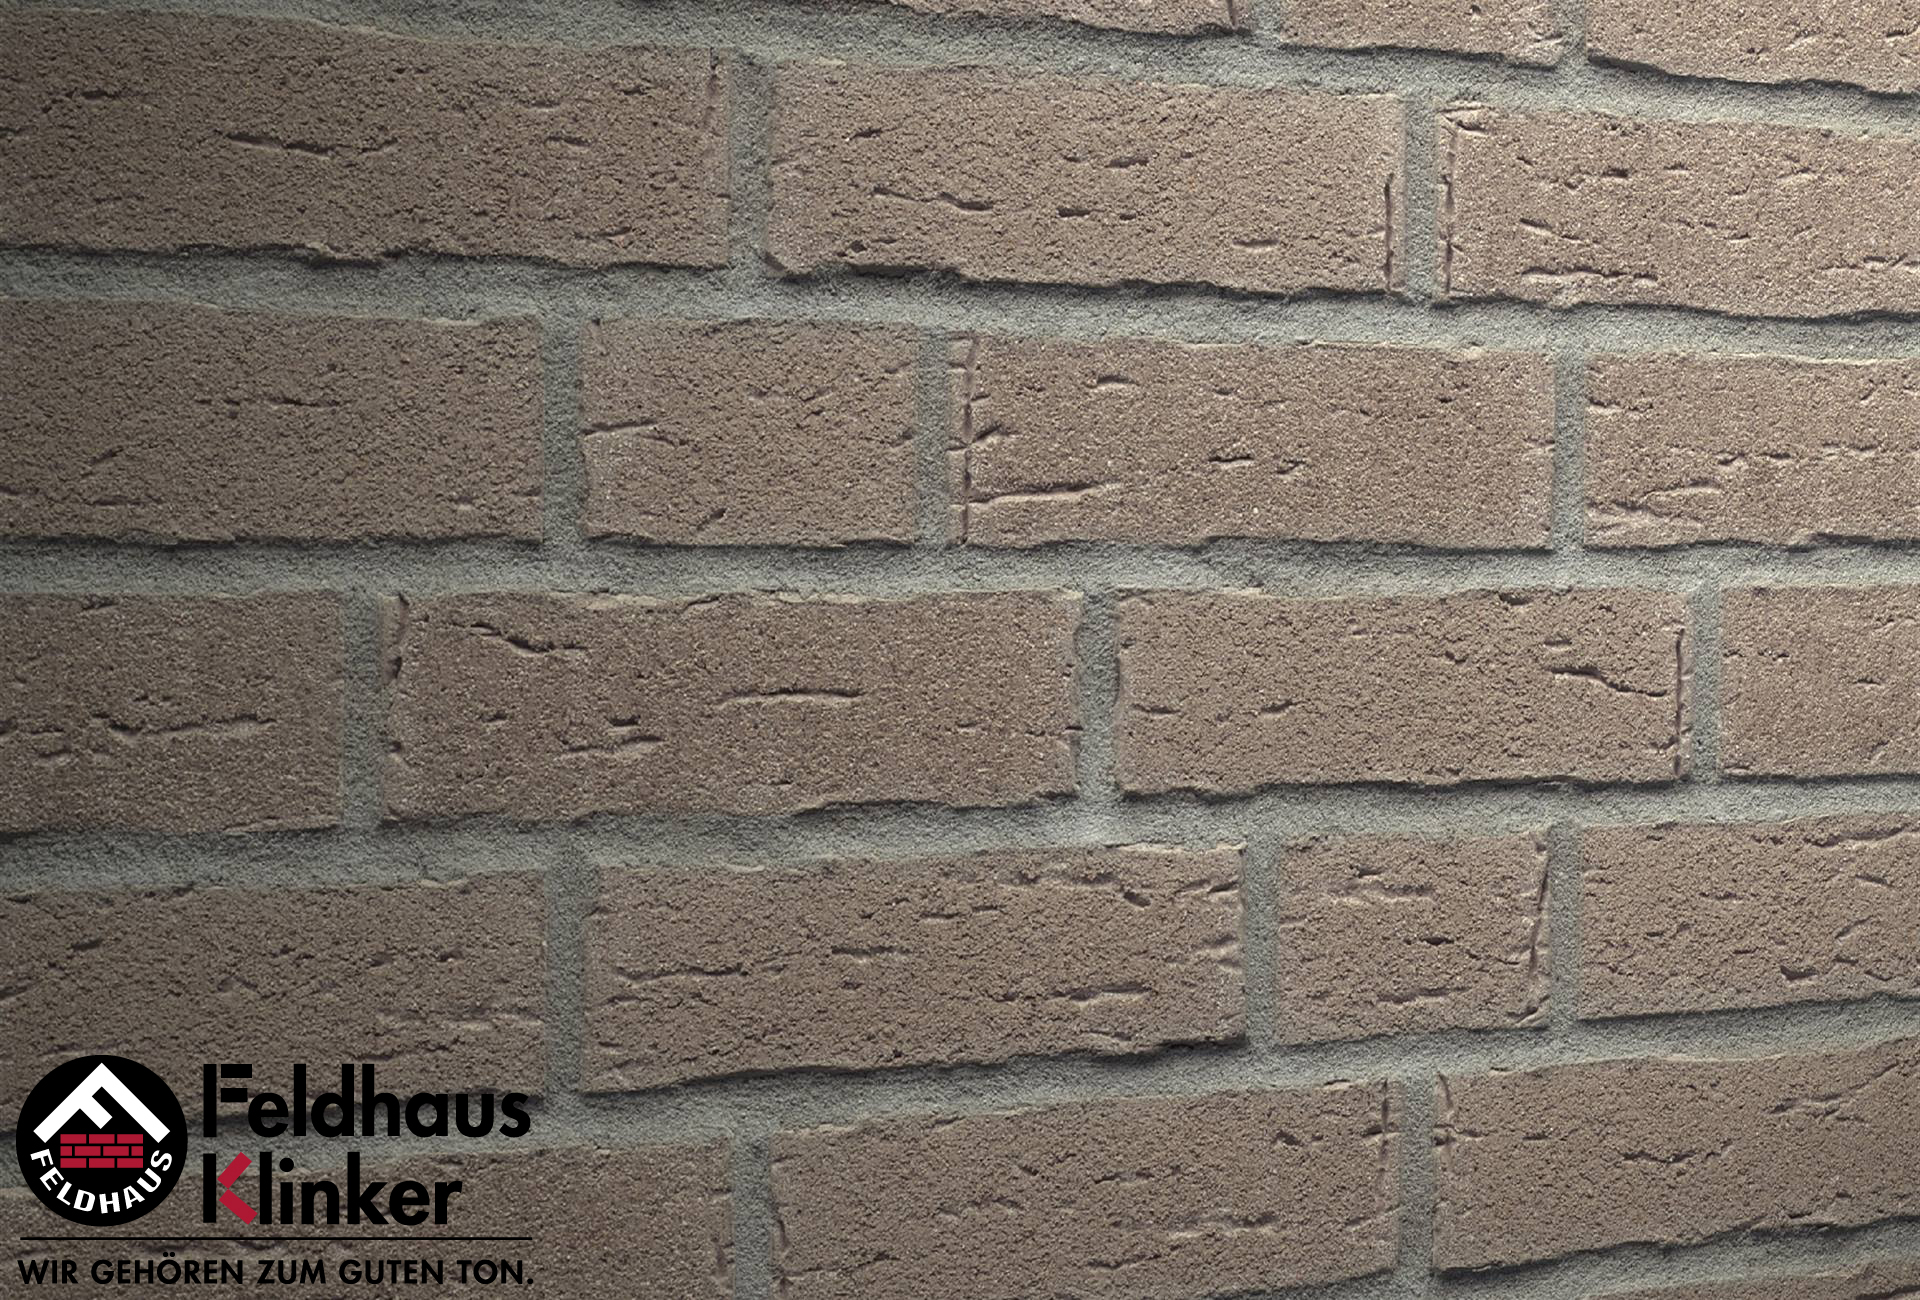 R680 Клинкерная плитка Feldhaus Klinker вид 1